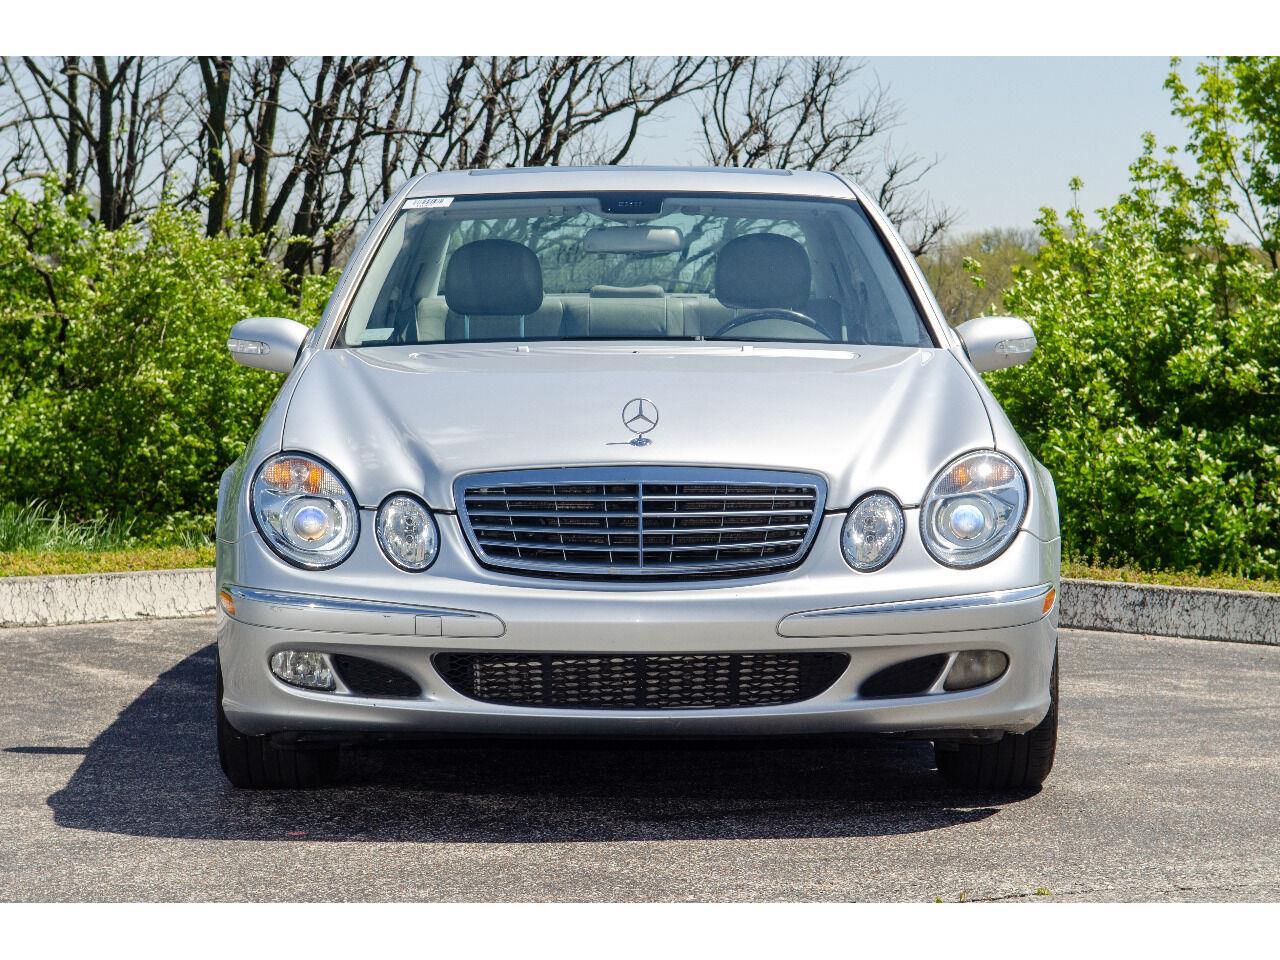 2006 Mercedes-Benz E-Class (CC-1359580) for sale in St Louis, Missouri